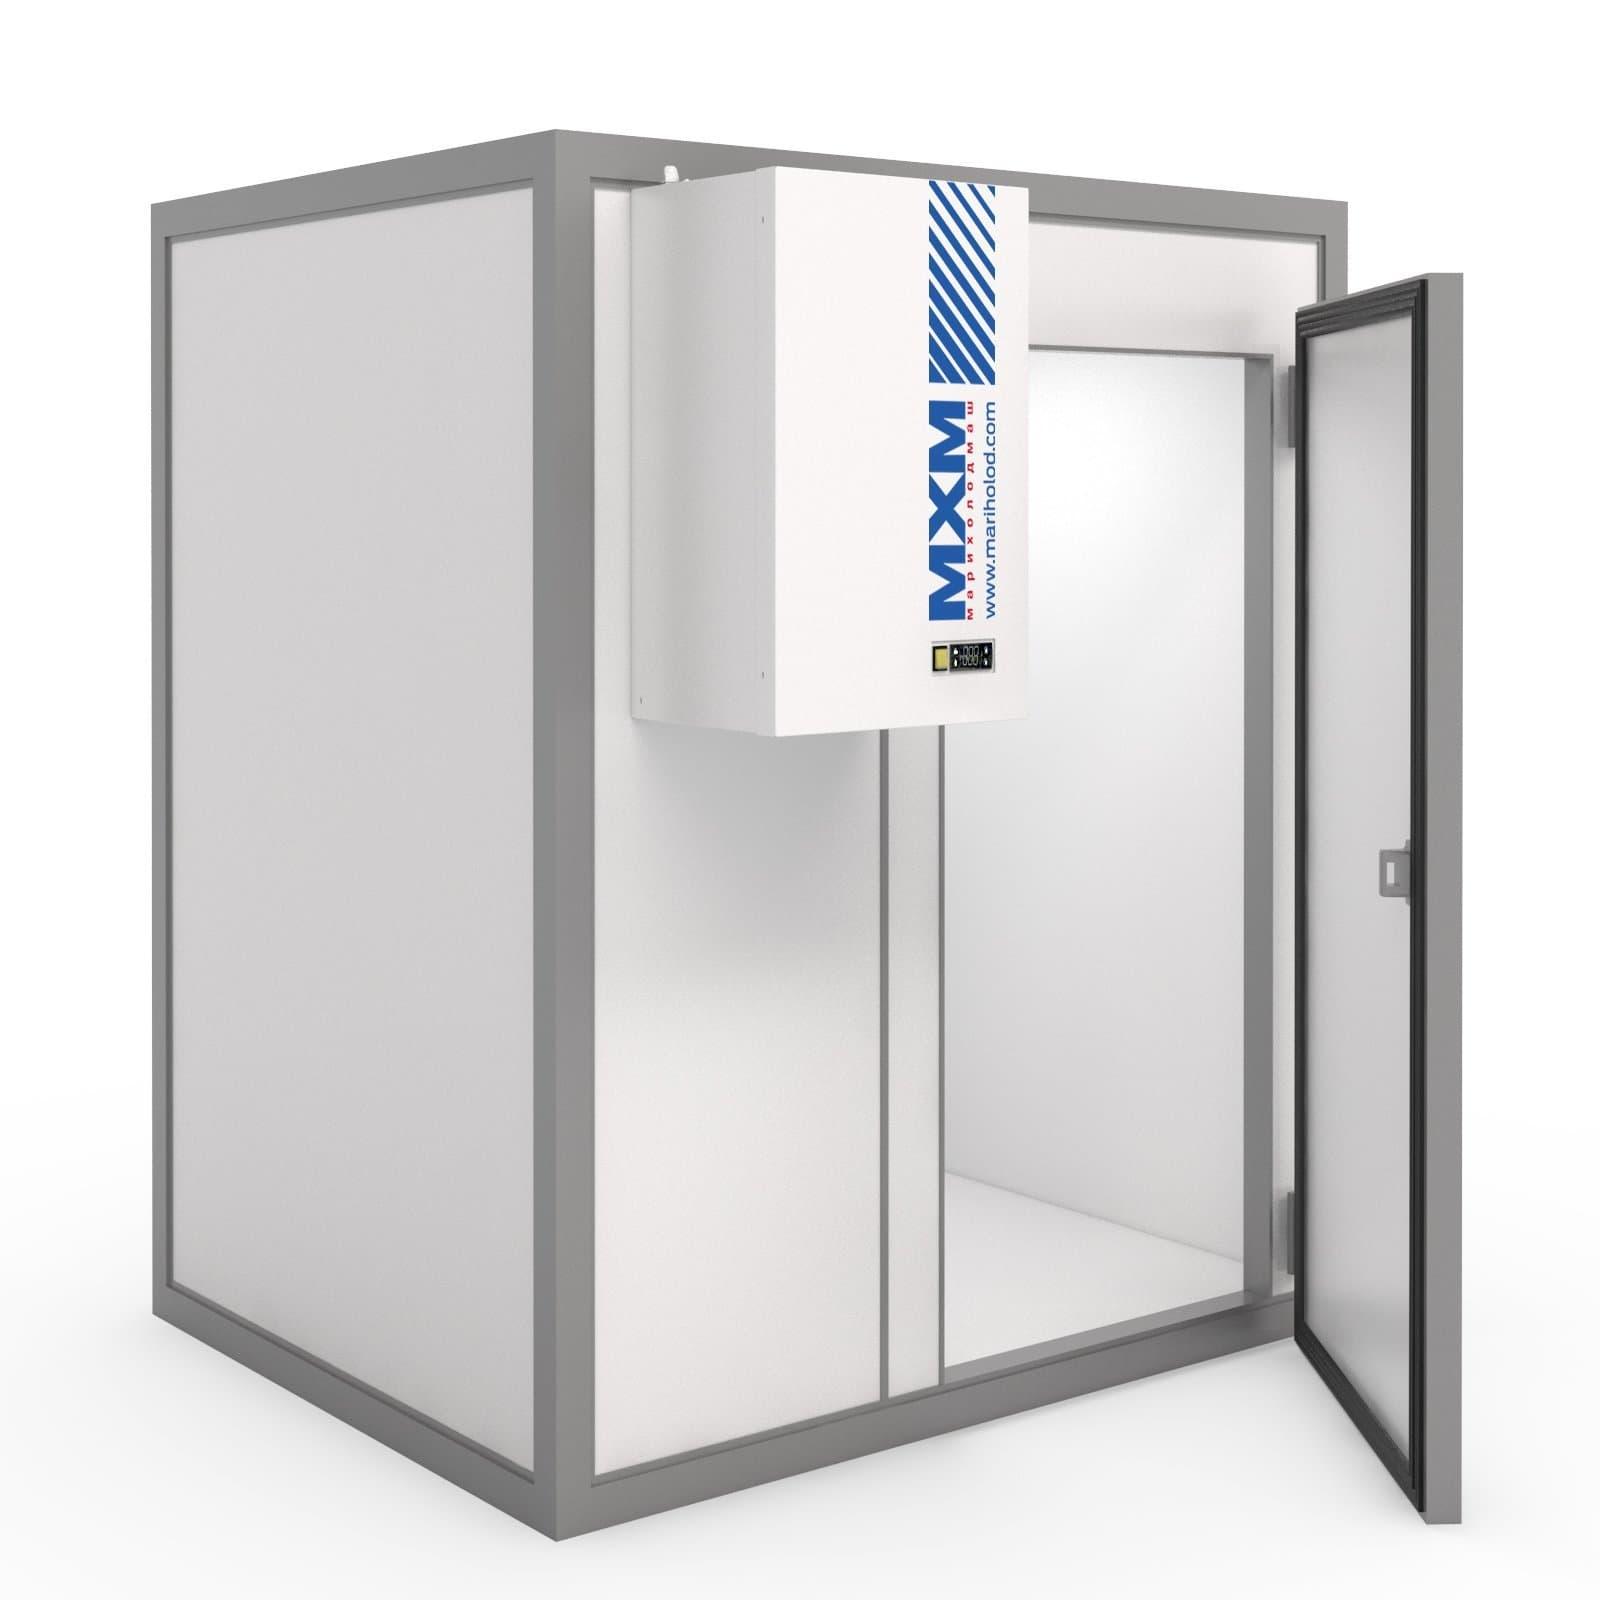 Камера холодильная МХМ КХН-24,88 1360×8260×2720